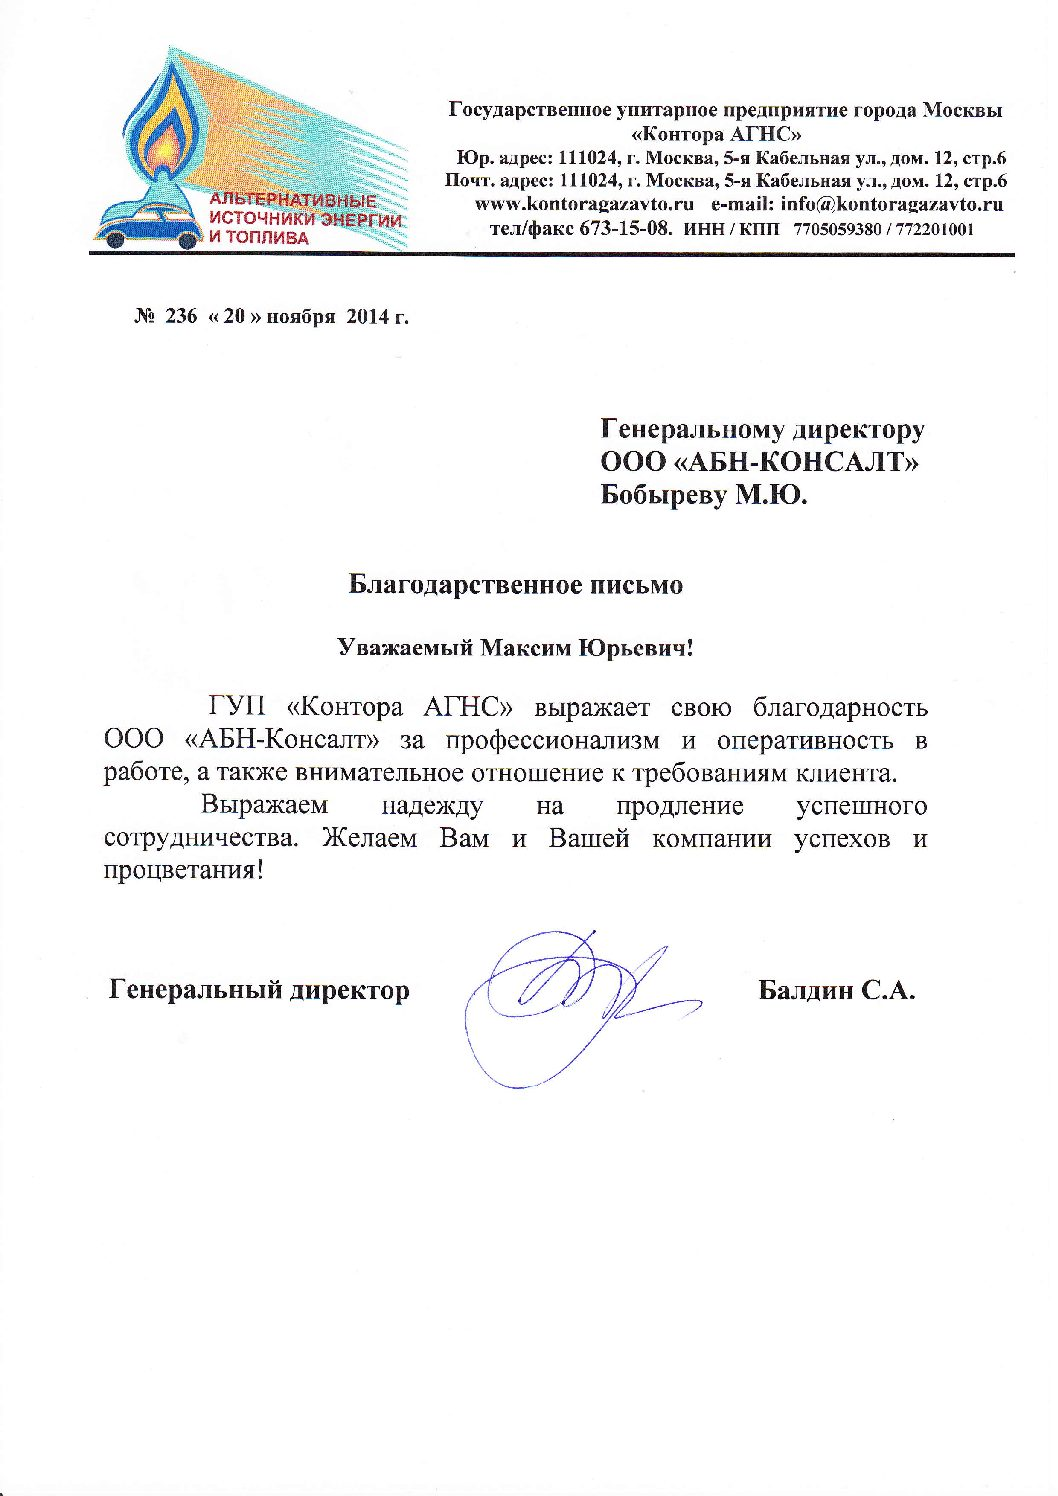 "ГУП ""Контора АГНС"""